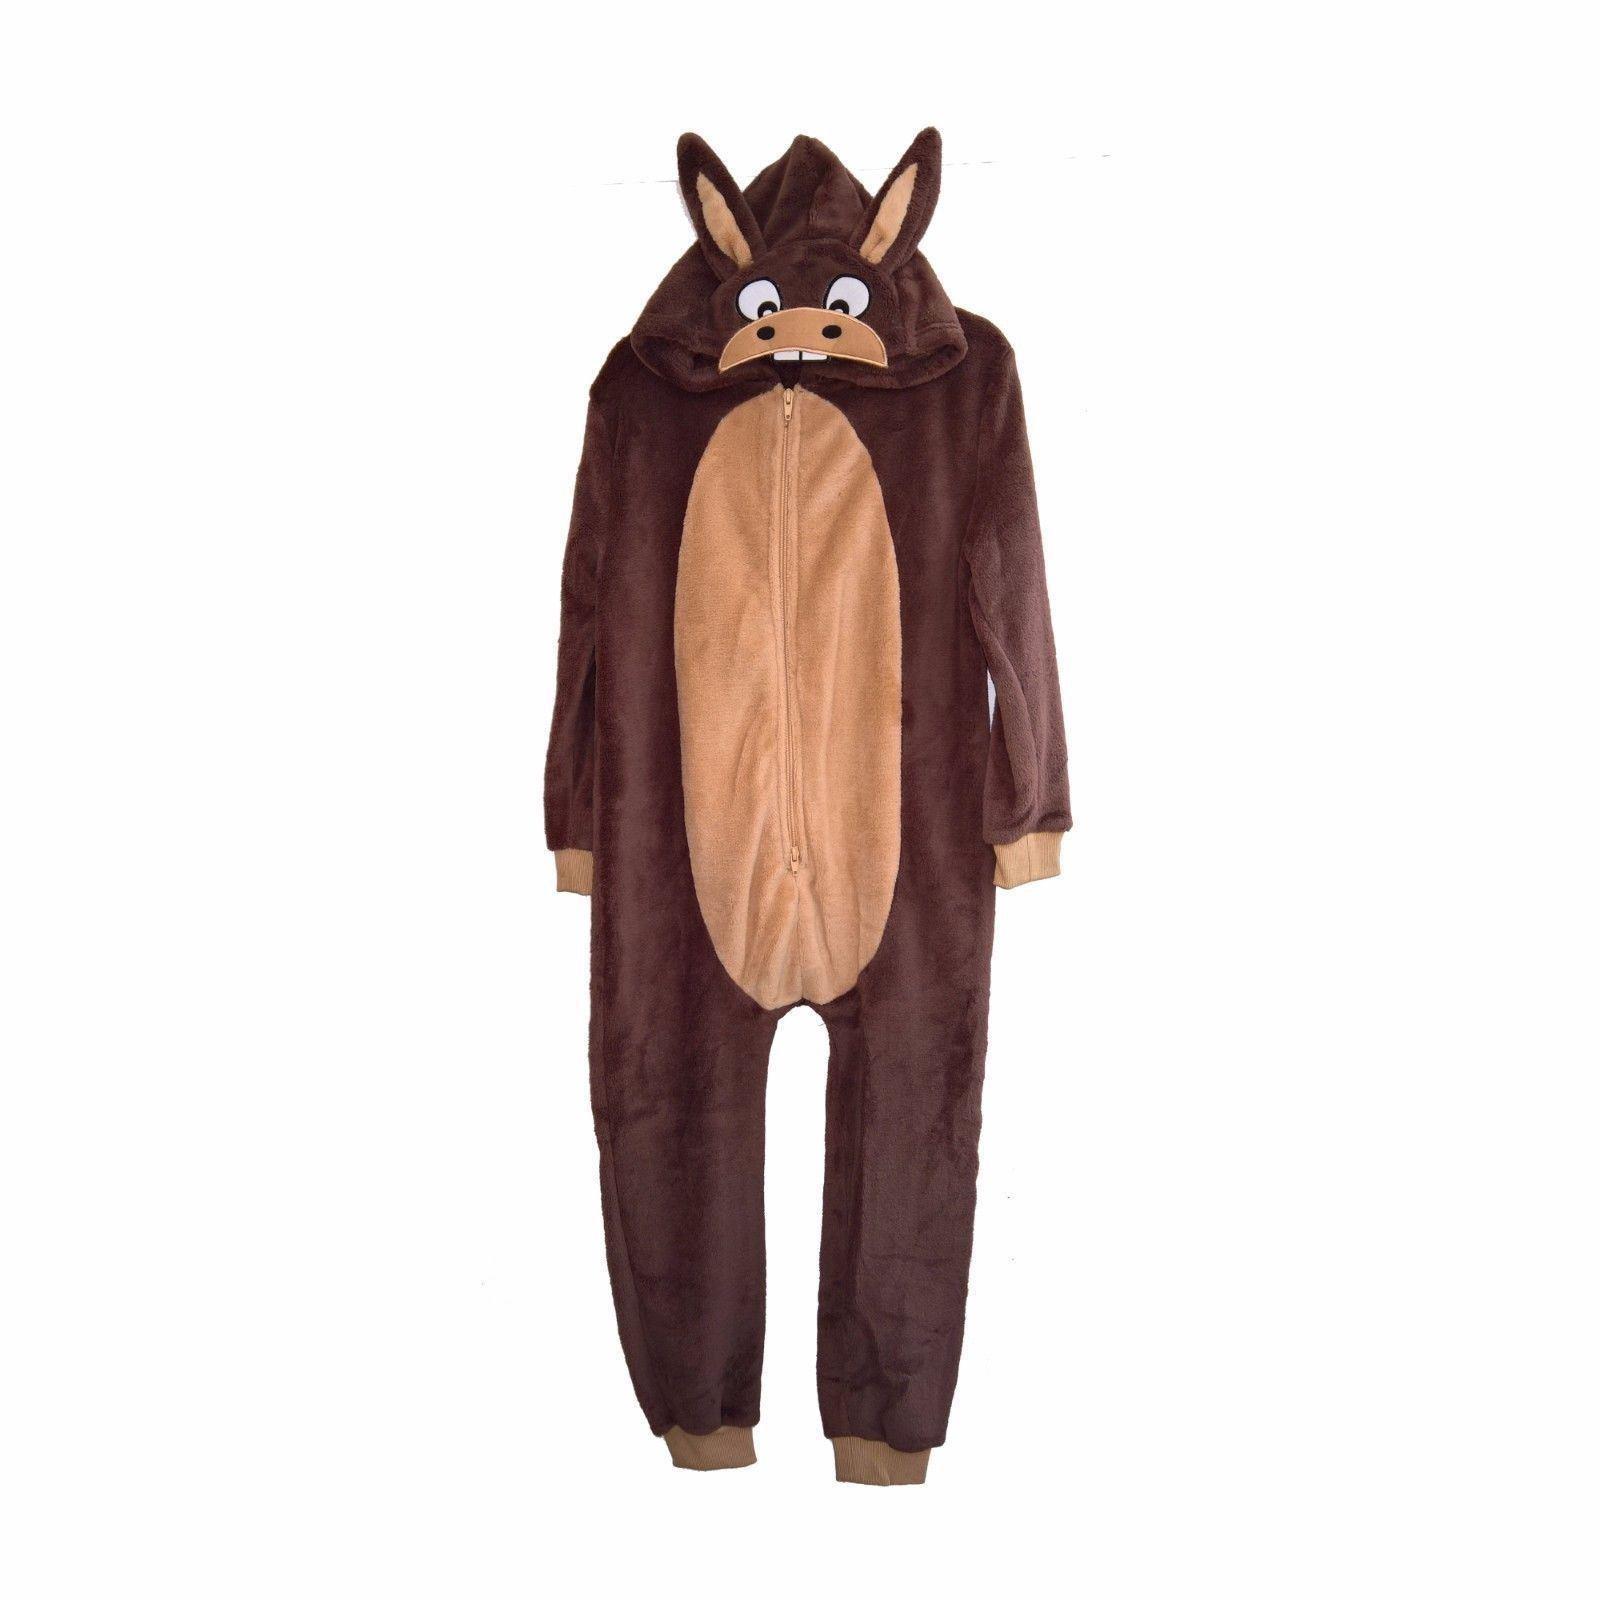 Jim Jams Donkey Costume Fleece Onesie